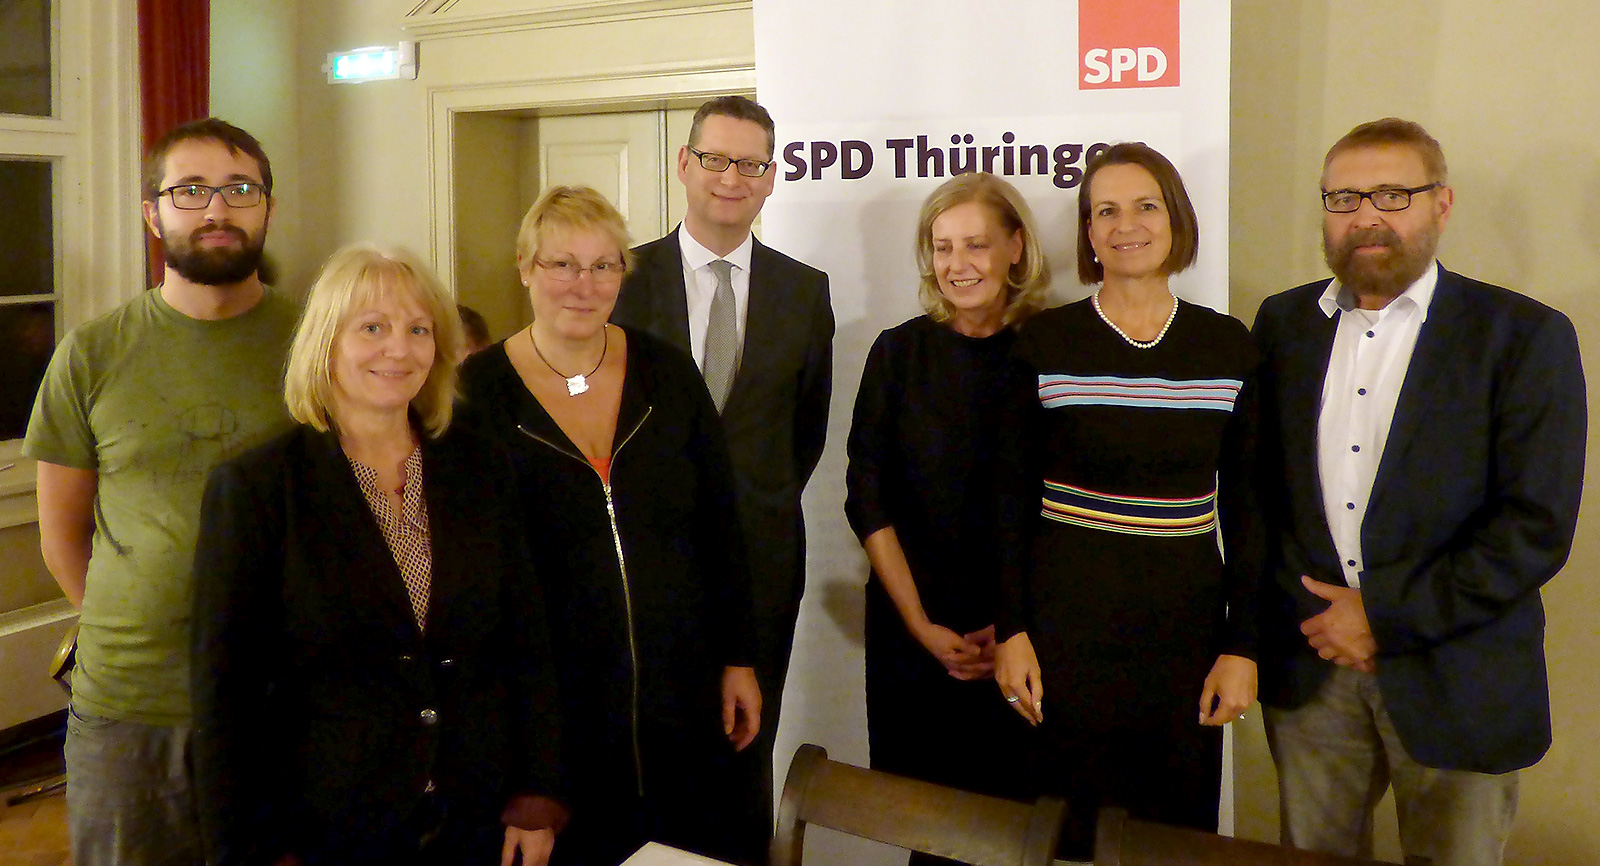 Gründung des Kulturforums der SPD in Thüringen